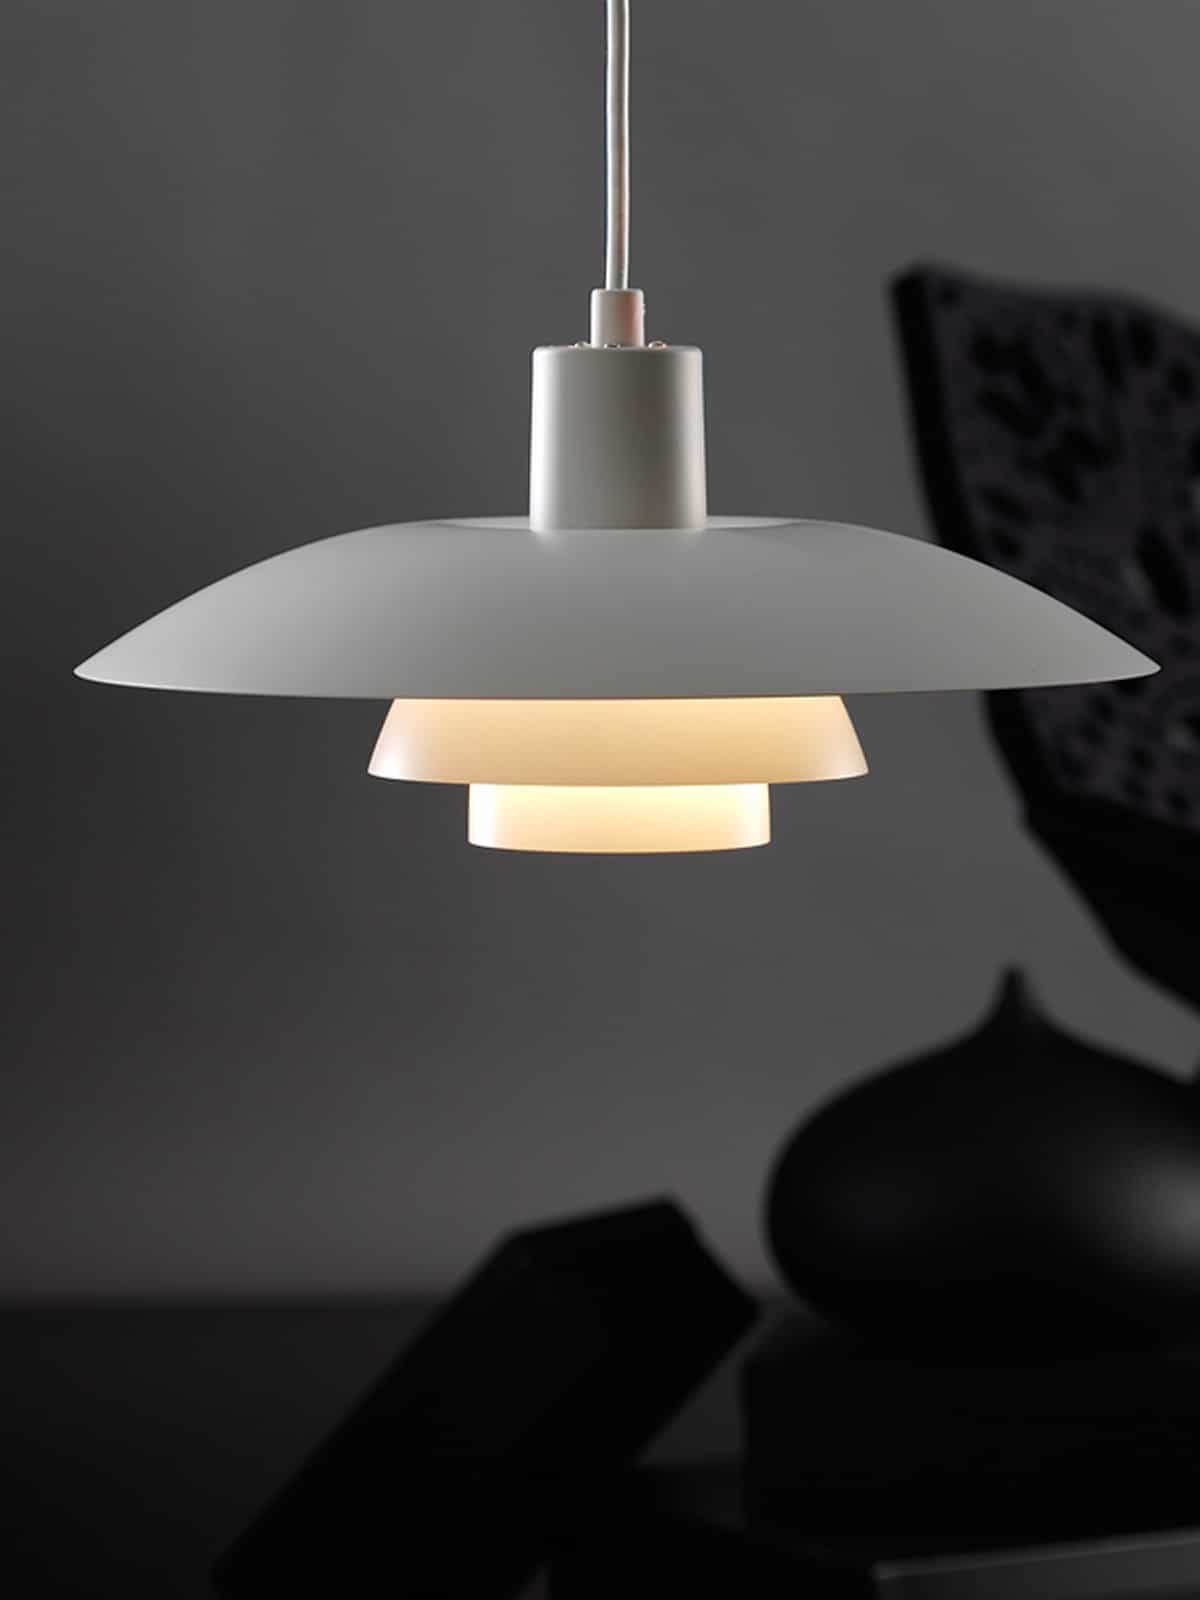 PH 4/3 - Lampen Leuchten Designerleuchten Online Berlin Design